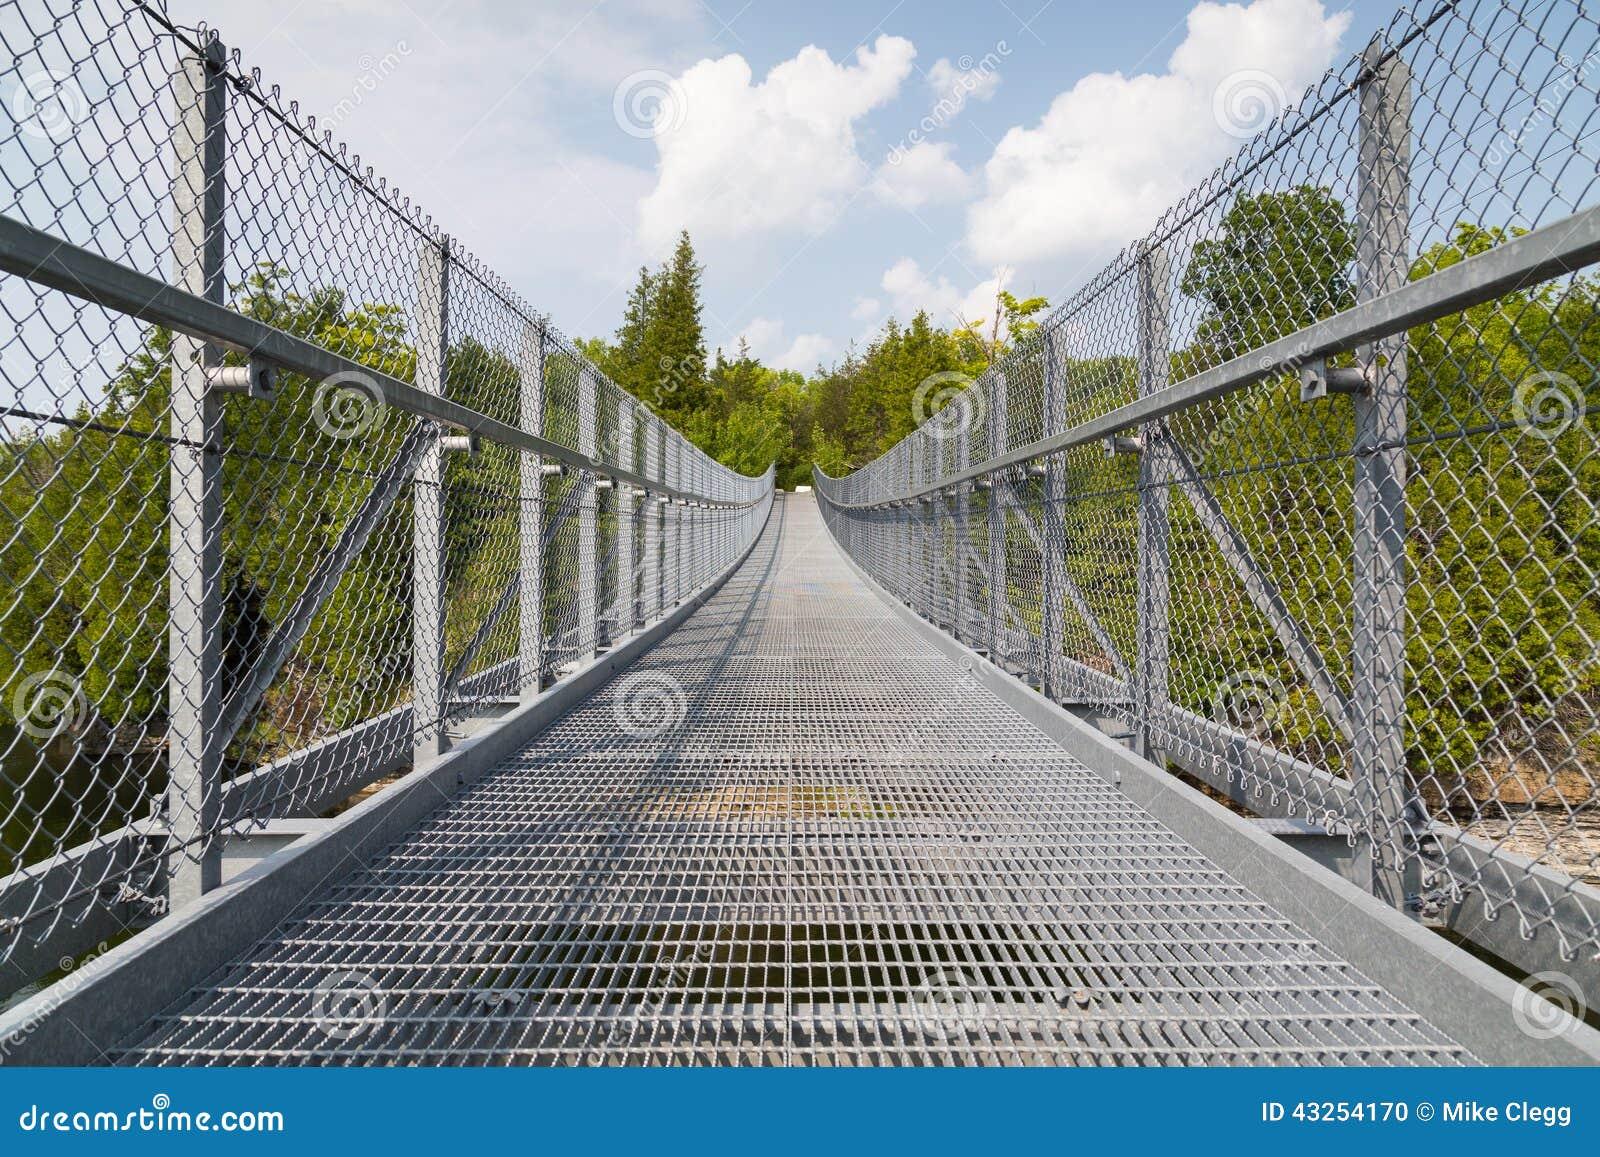 metal suspension bridge stock photo image 43254170. Black Bedroom Furniture Sets. Home Design Ideas